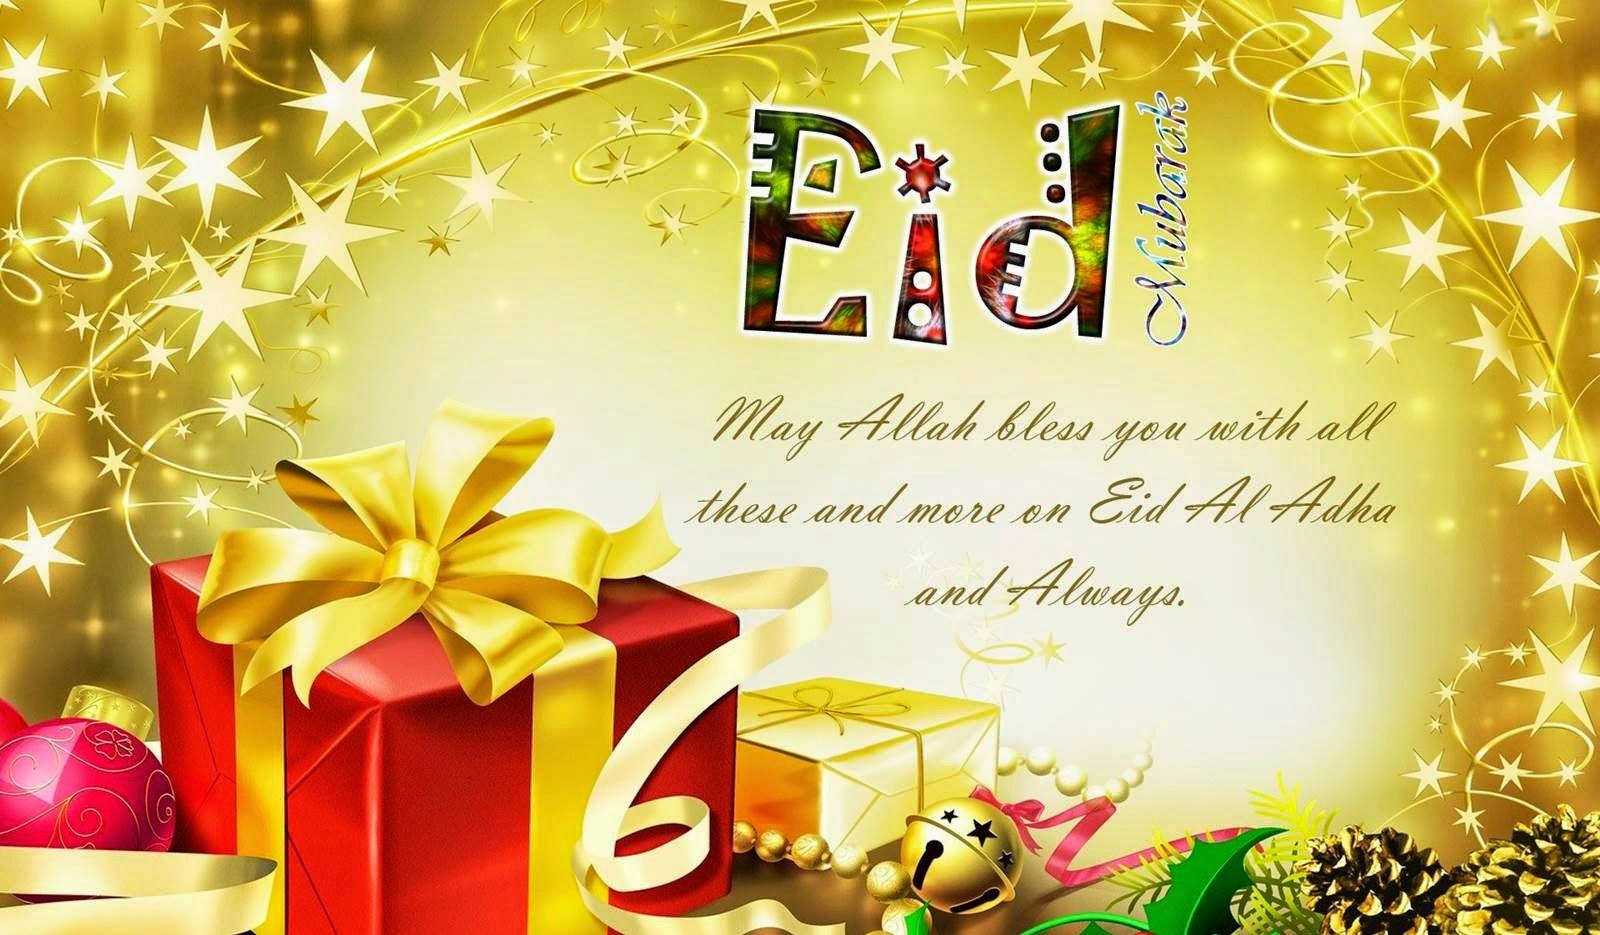 Islamic Greetings Eid Ul Adha Greetings